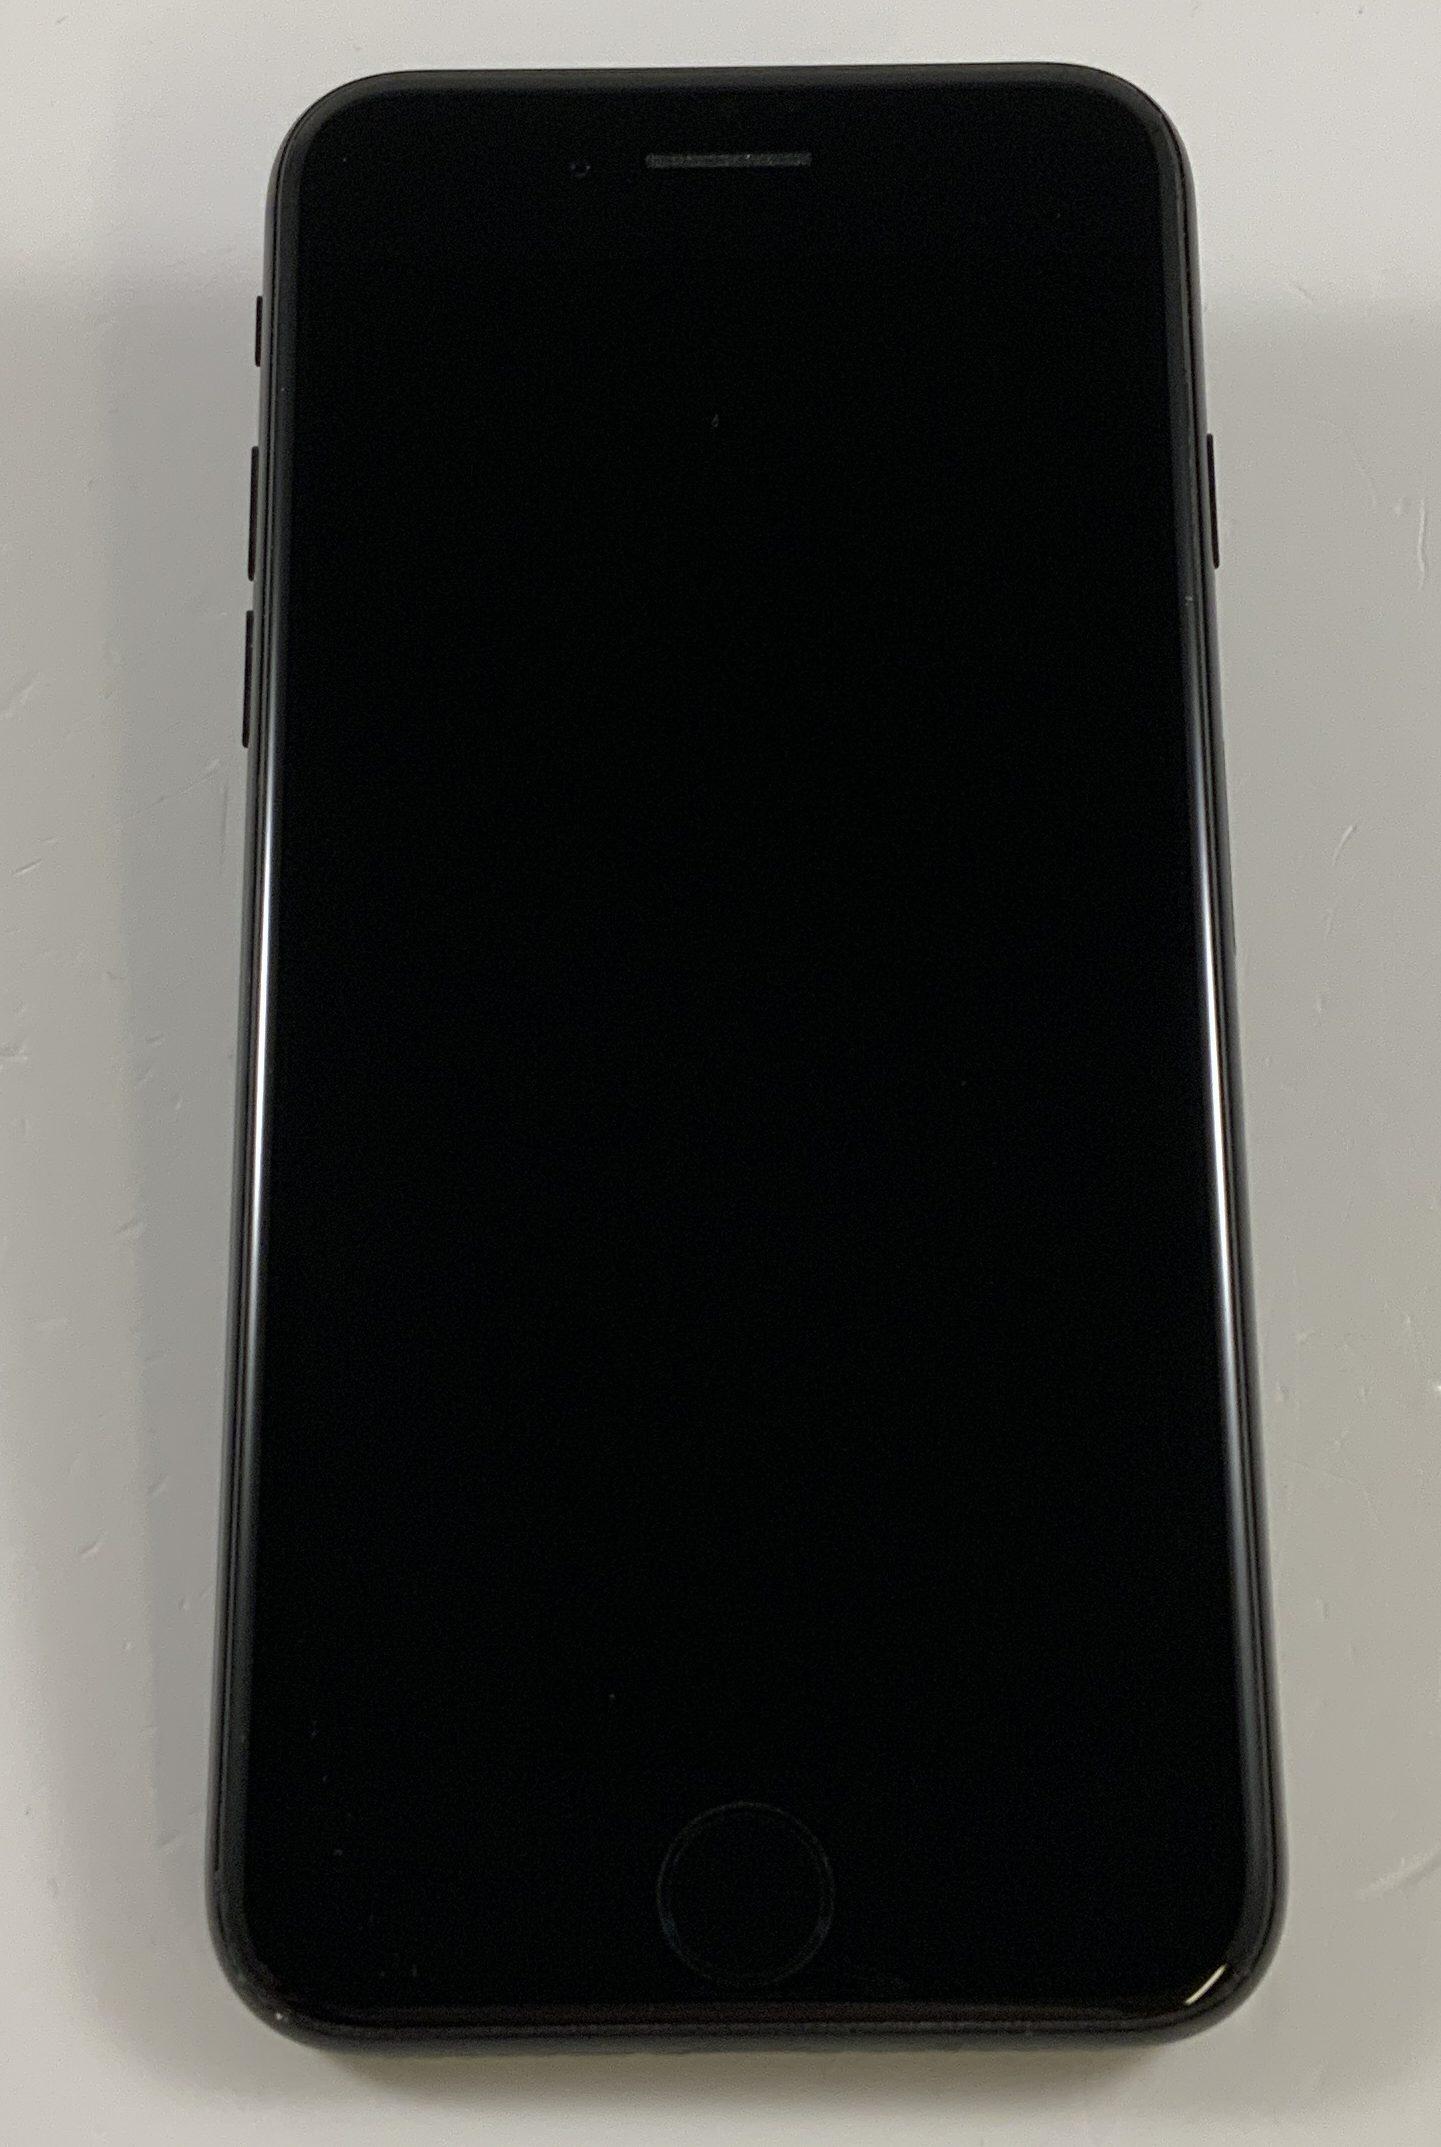 iPhone 7 32GB, 32GB, Jet Black, immagine 1